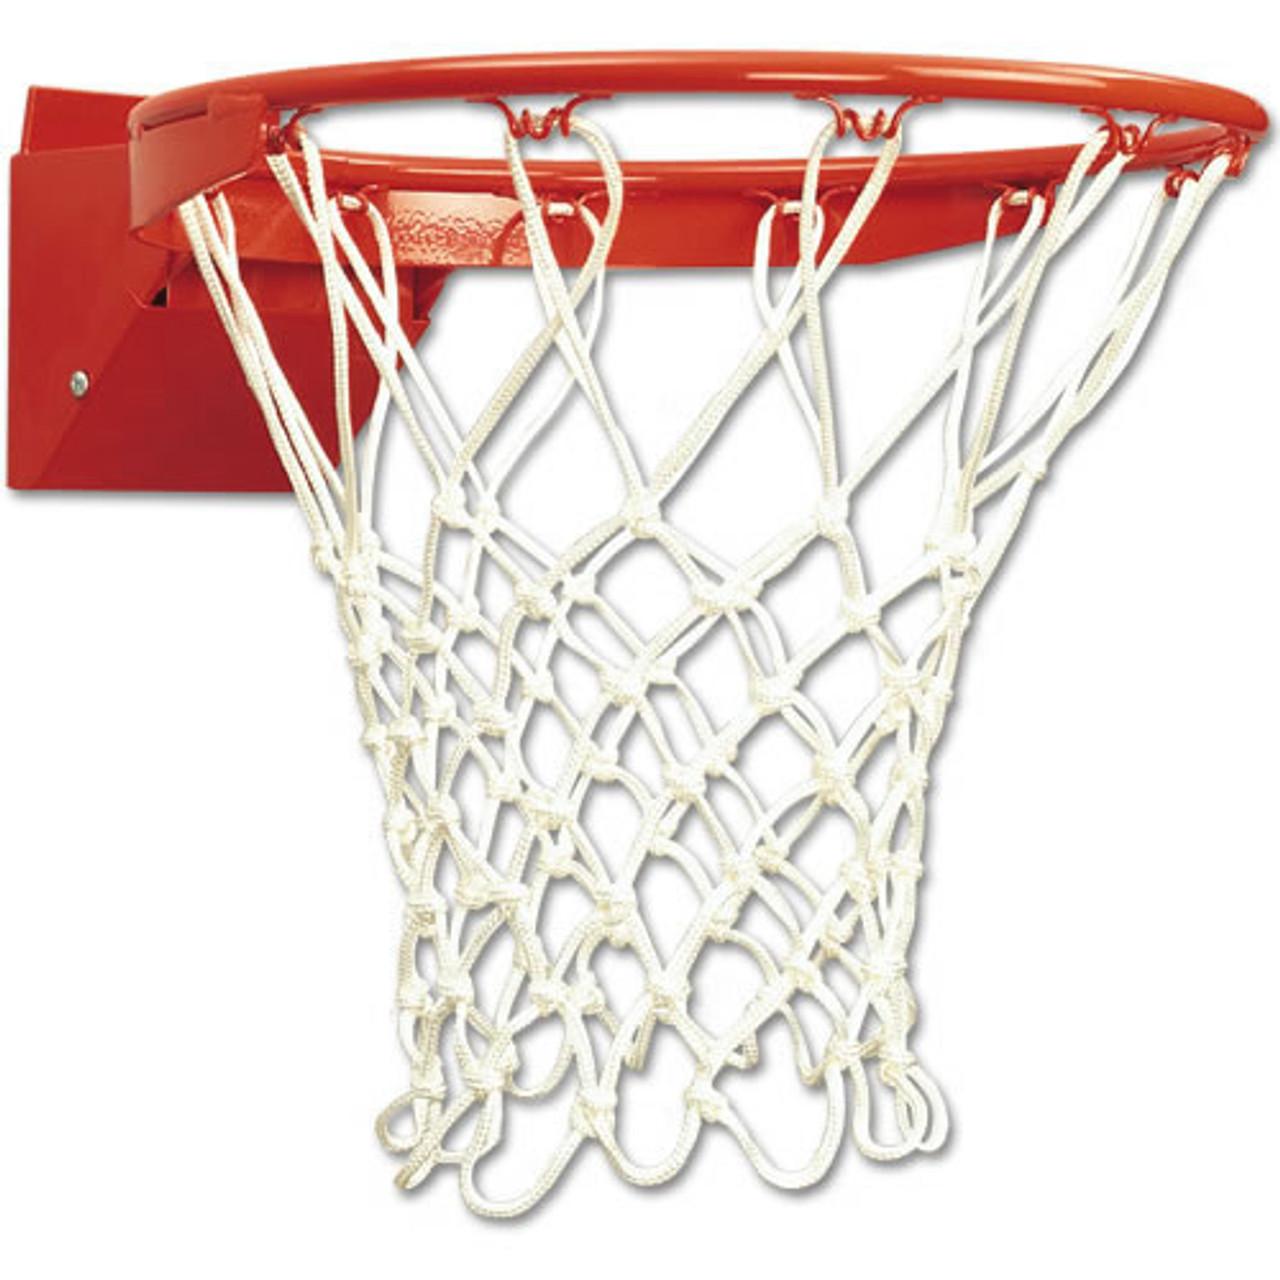 Bison ProTech Breakaway Basketball Goal